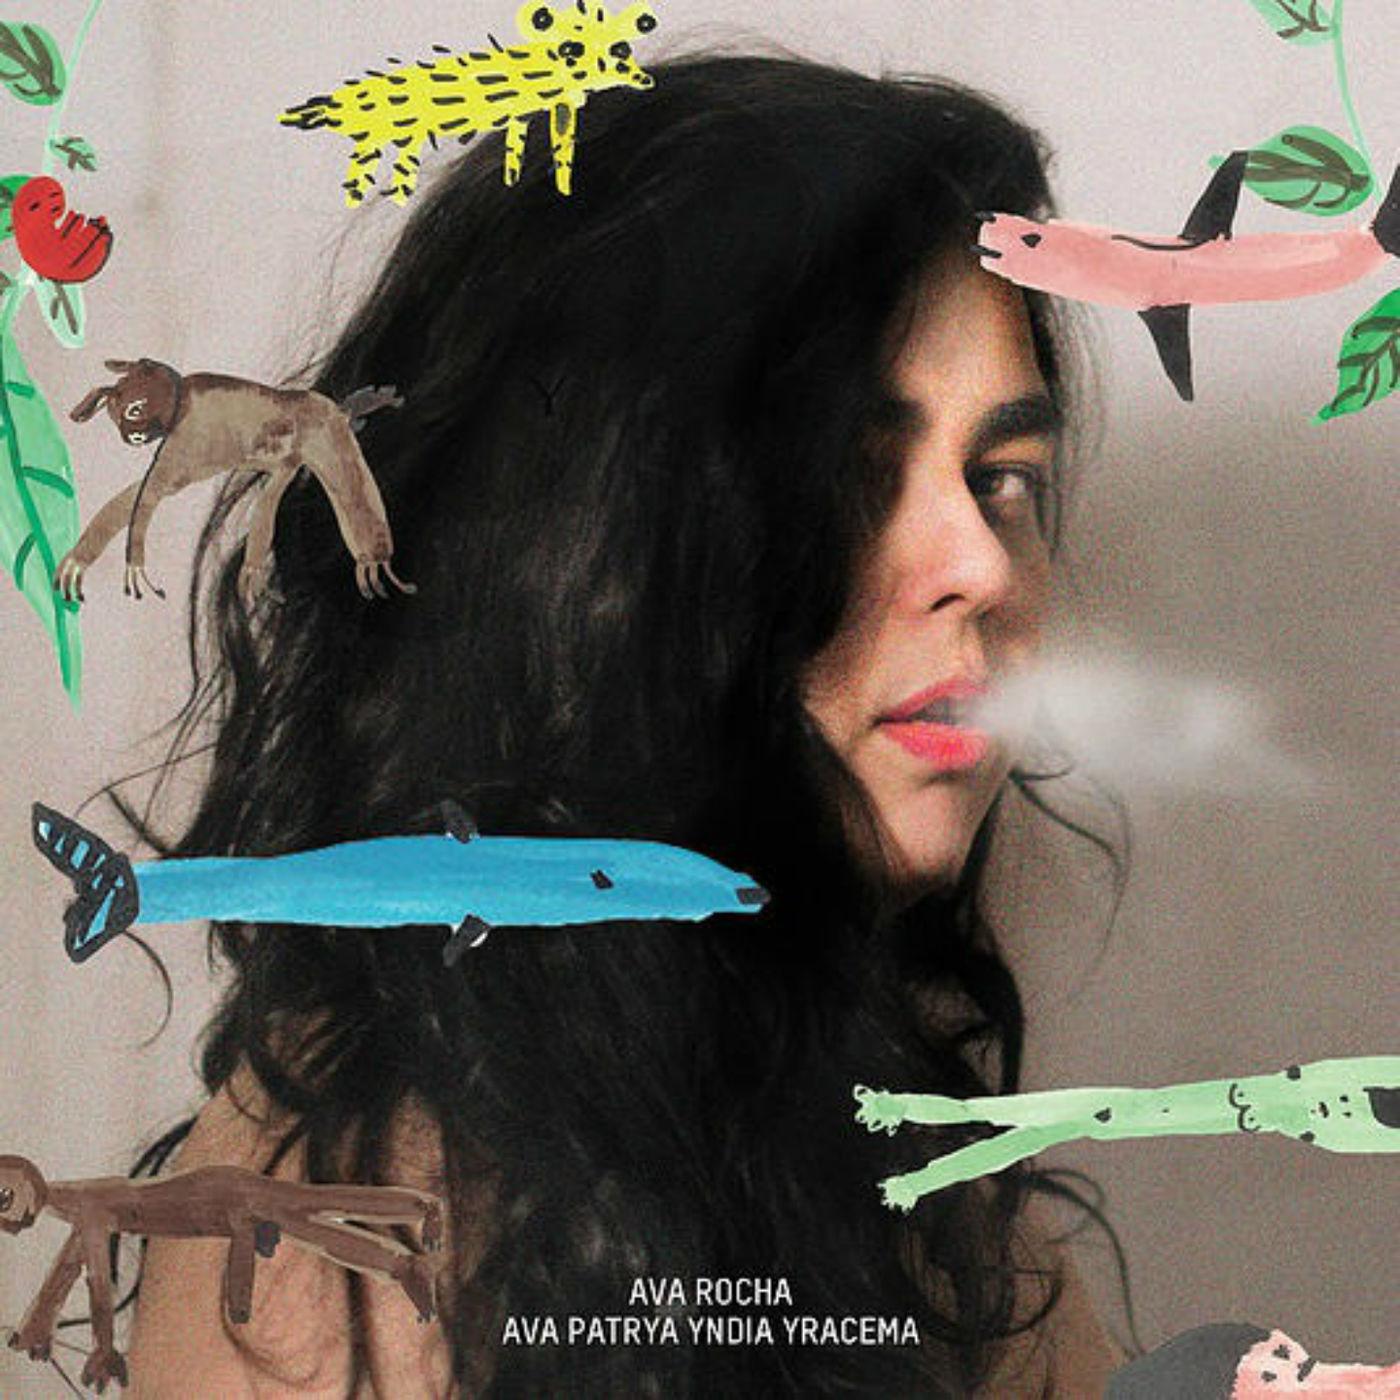 Ava Rocha - Ava Patrya Yndia Yracema (Álbum)